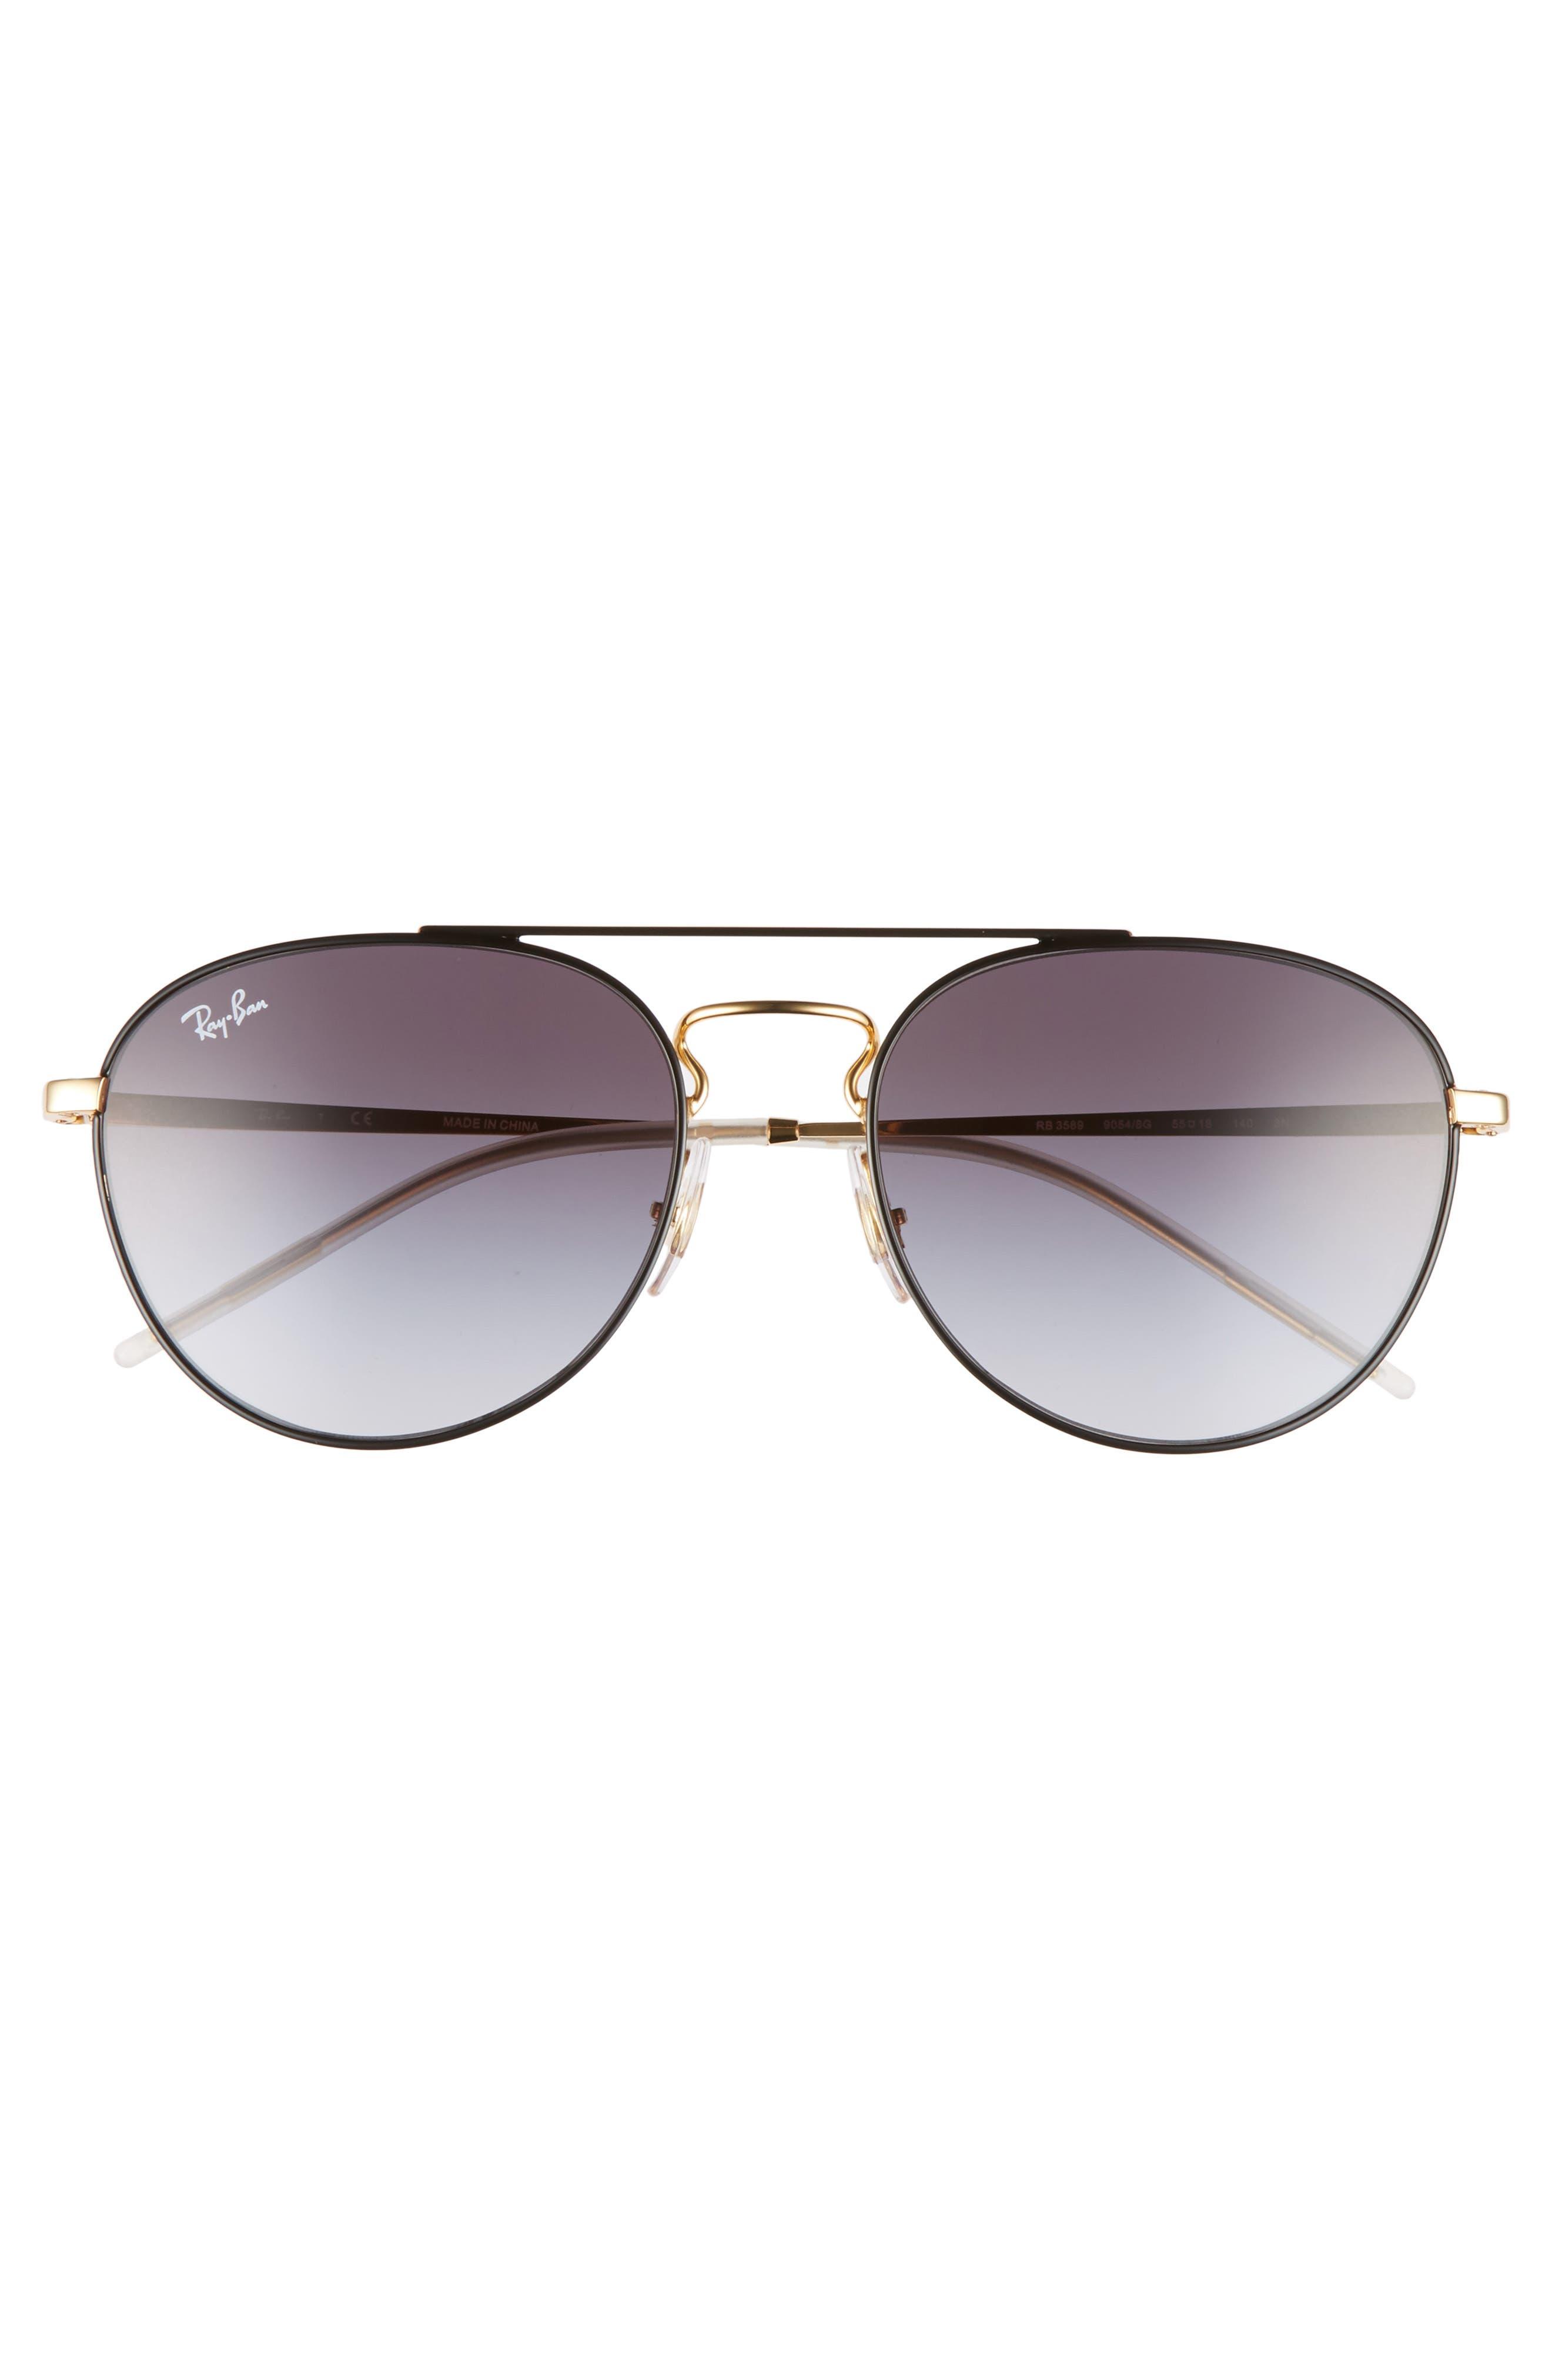 55mm Gradient Lens Round Aviator Sunglasses,                             Alternate thumbnail 4, color,                             001